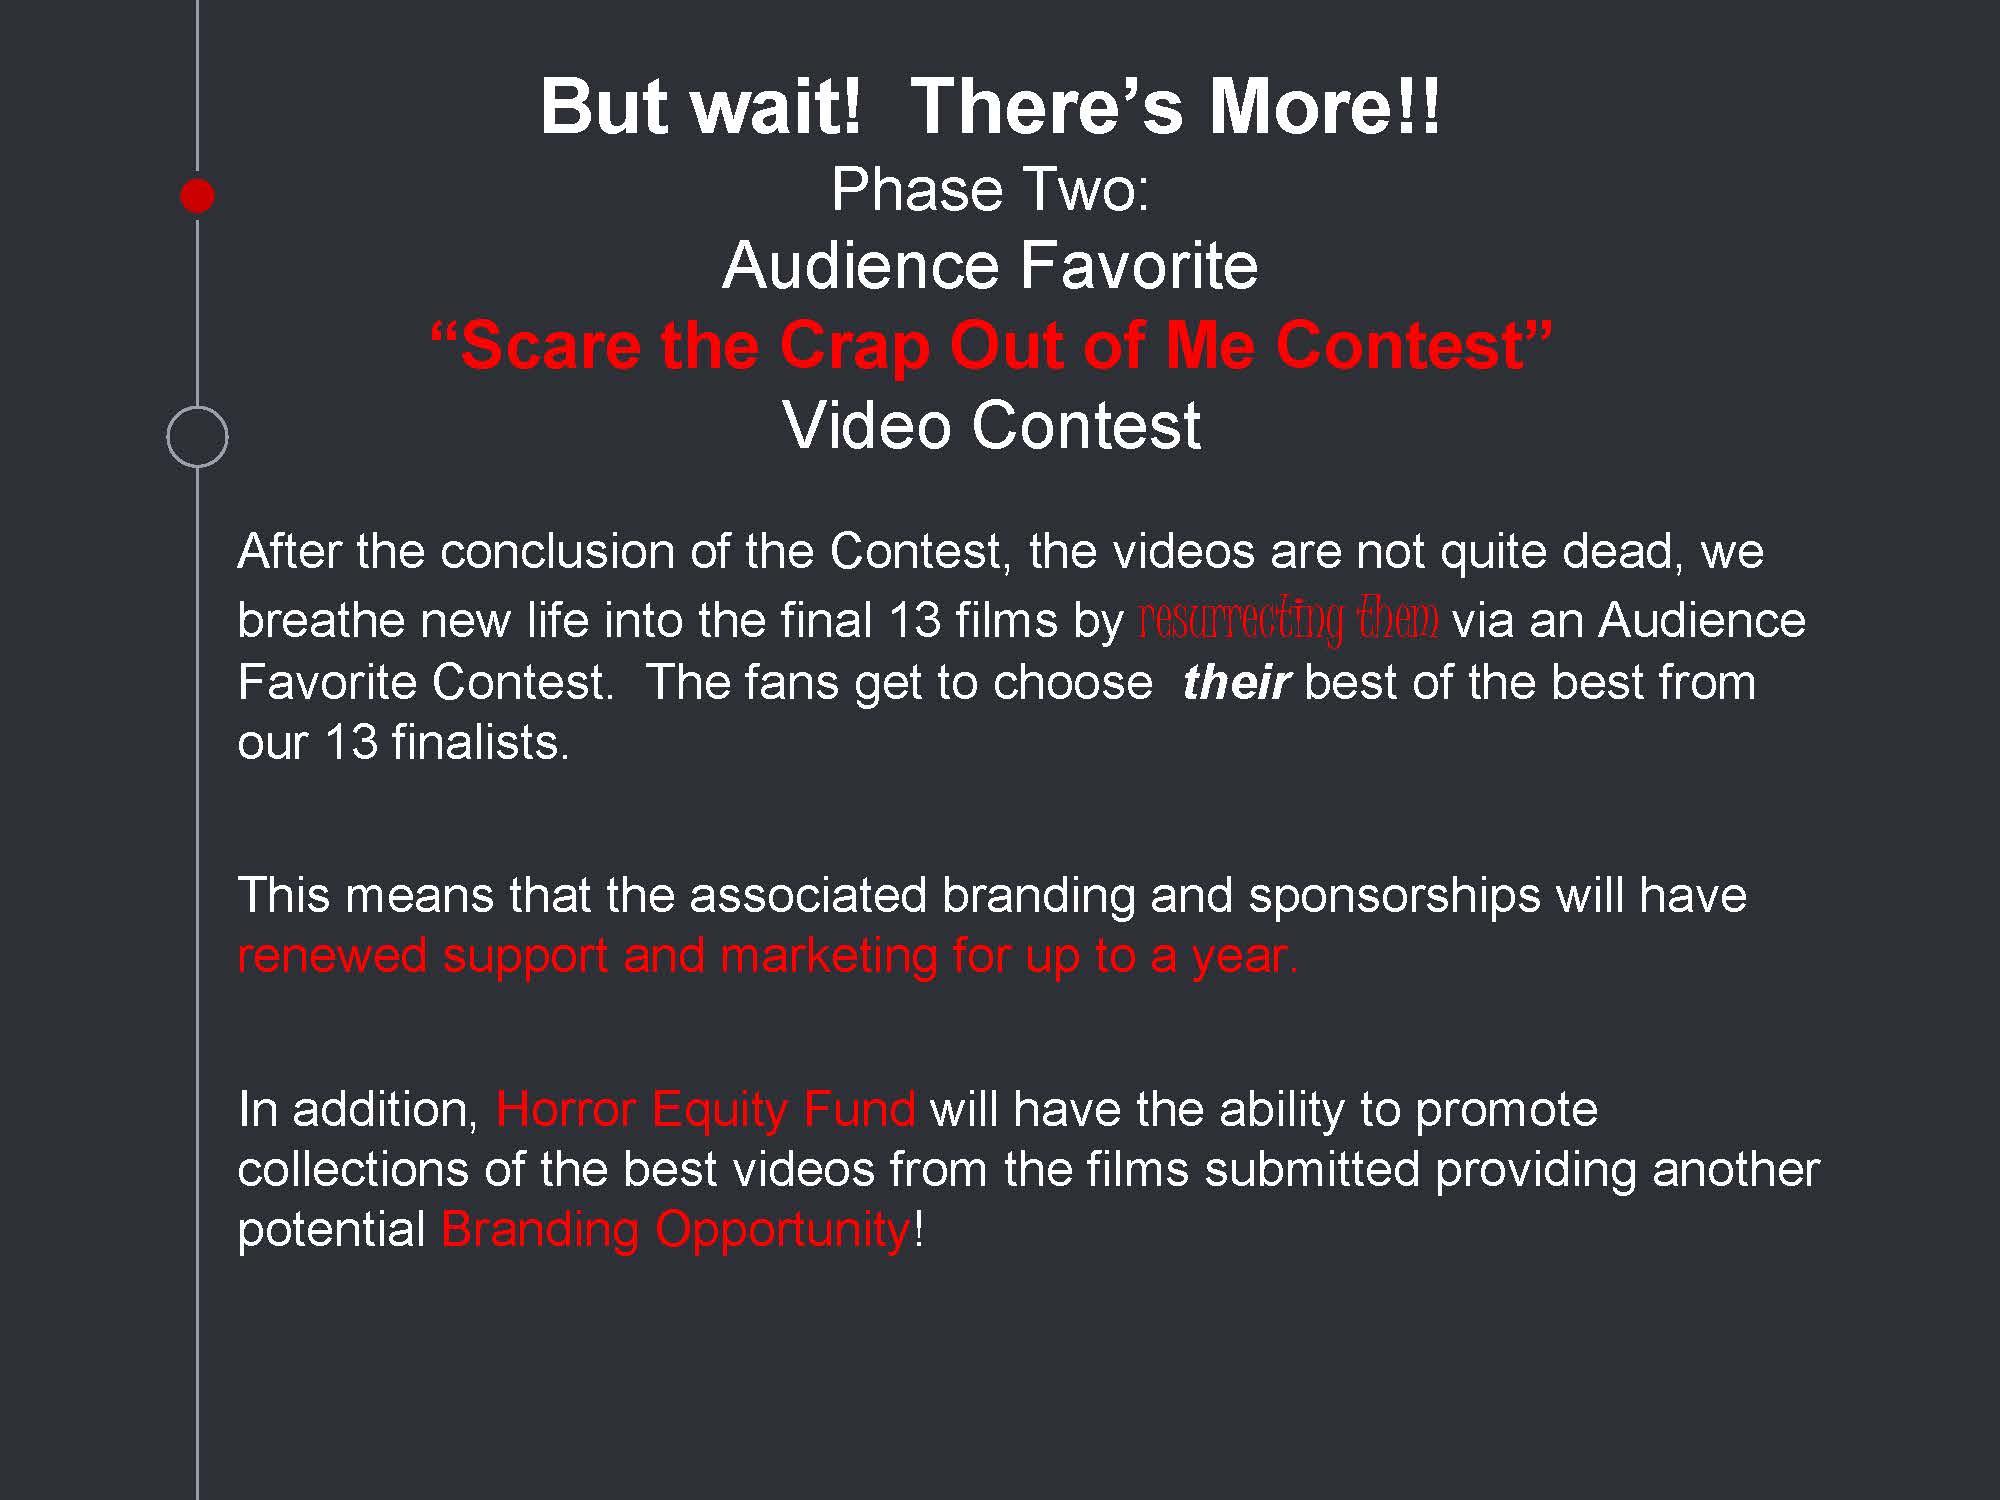 REVISED V20 -HorrorEquityFund 1 Min Sponsor Pitch Deck FINAL JPG 2017_Page_08.jpg